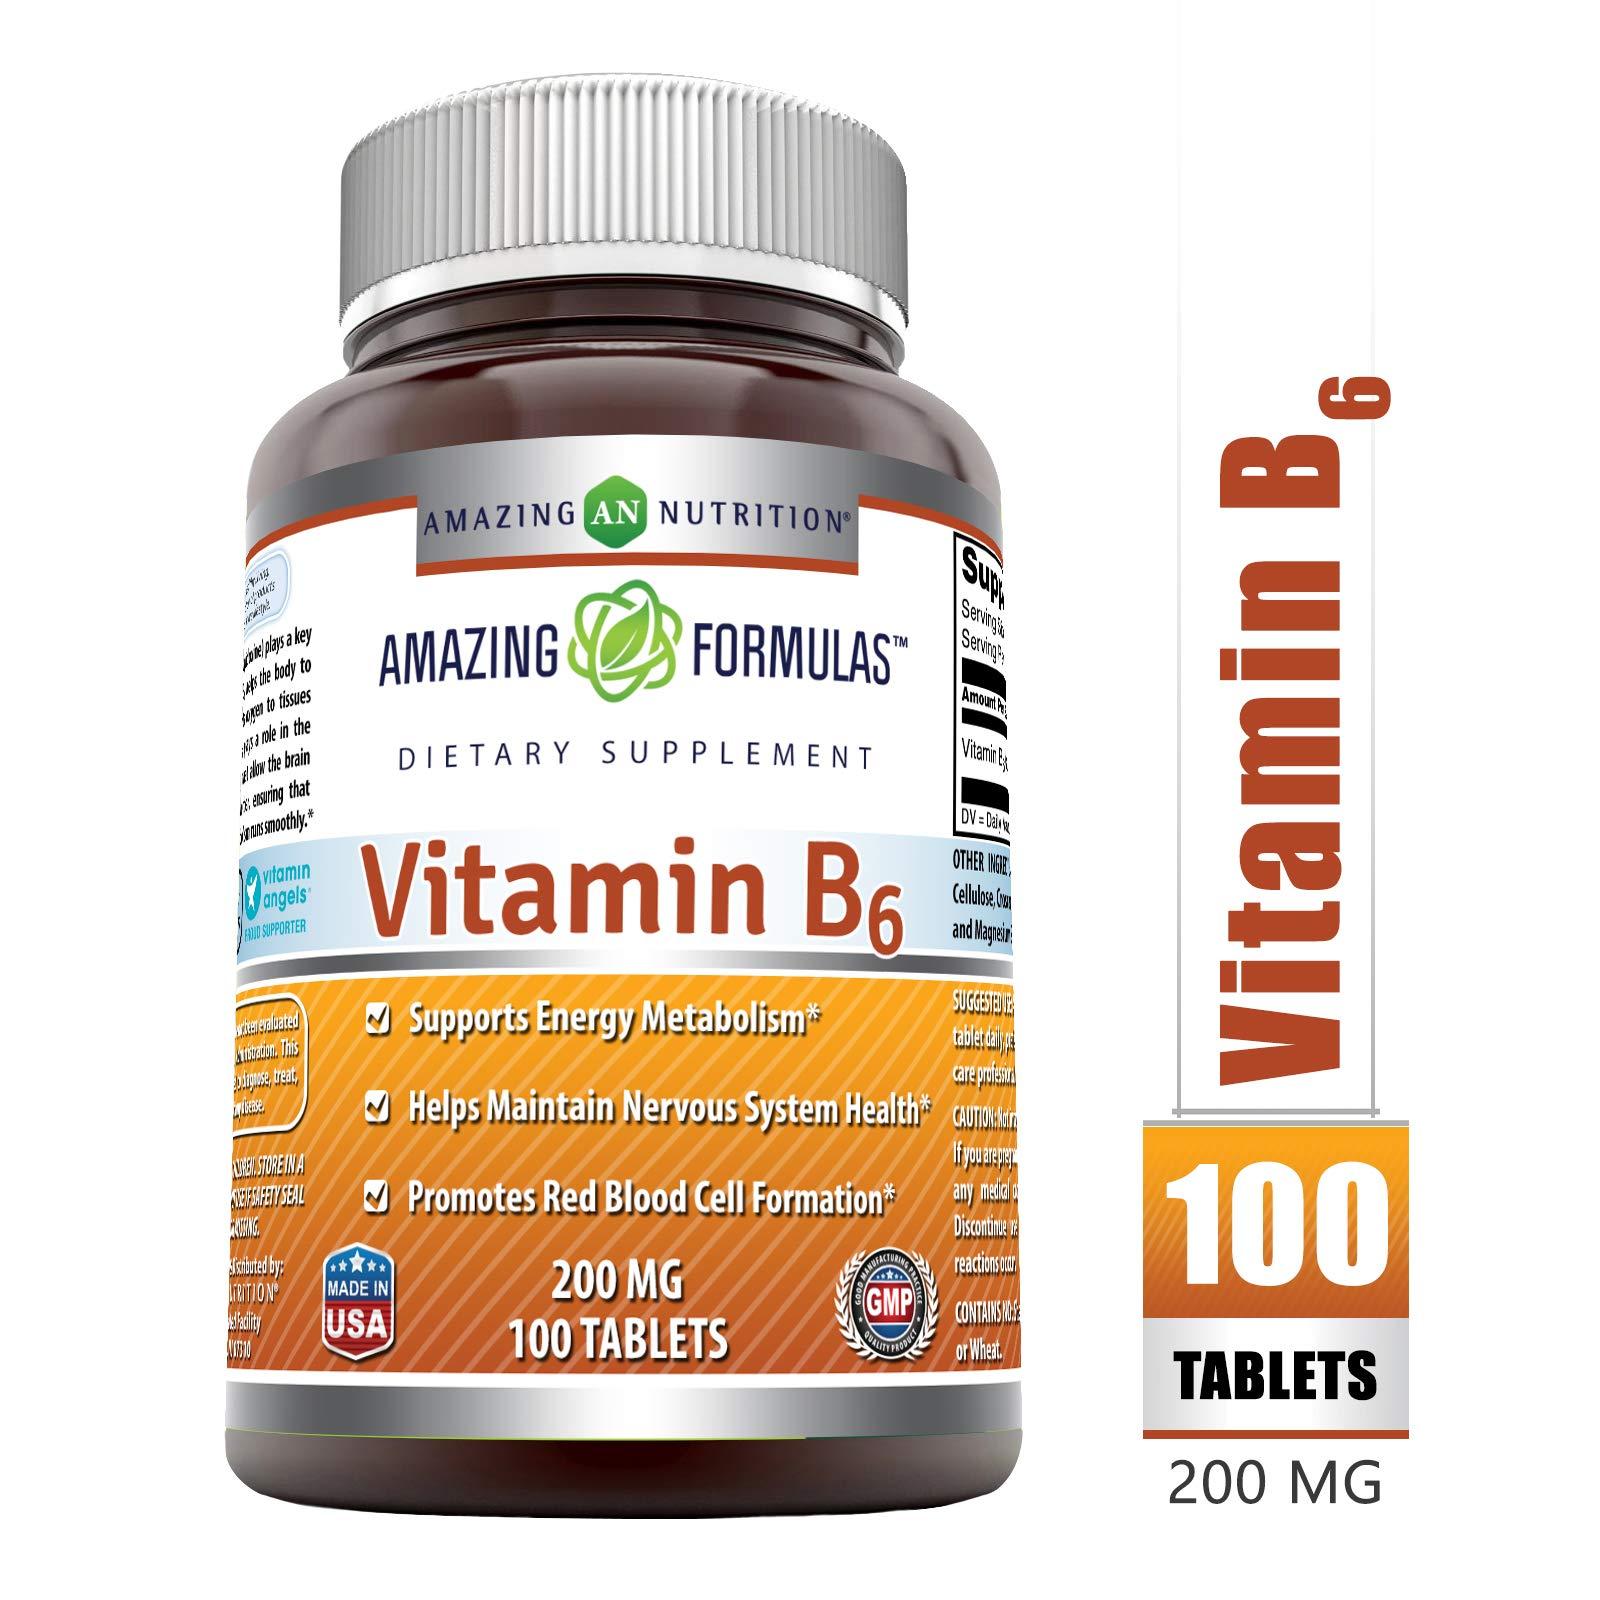 Amazing Formulas Vitamin B6 200Mg 100 Tablets by Amazing Nutrition